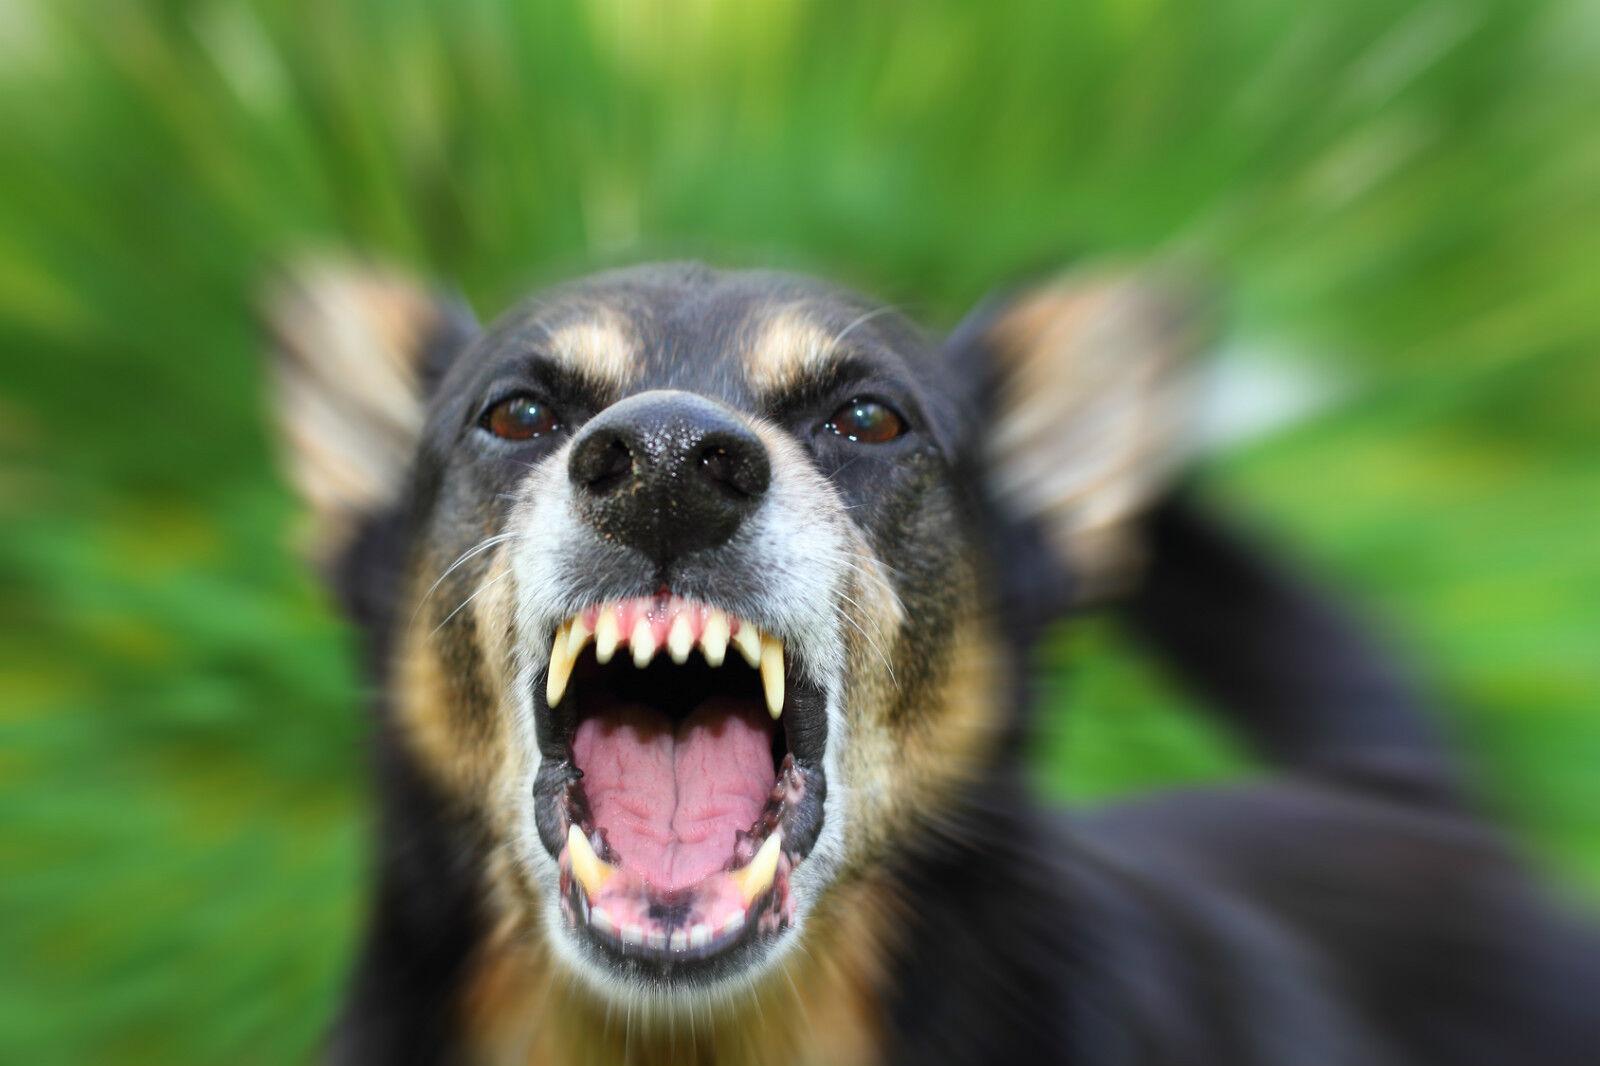 2x ISOTRONIC Raccoon Schreck – Battery Powered Dog Shock & CAT Distributor